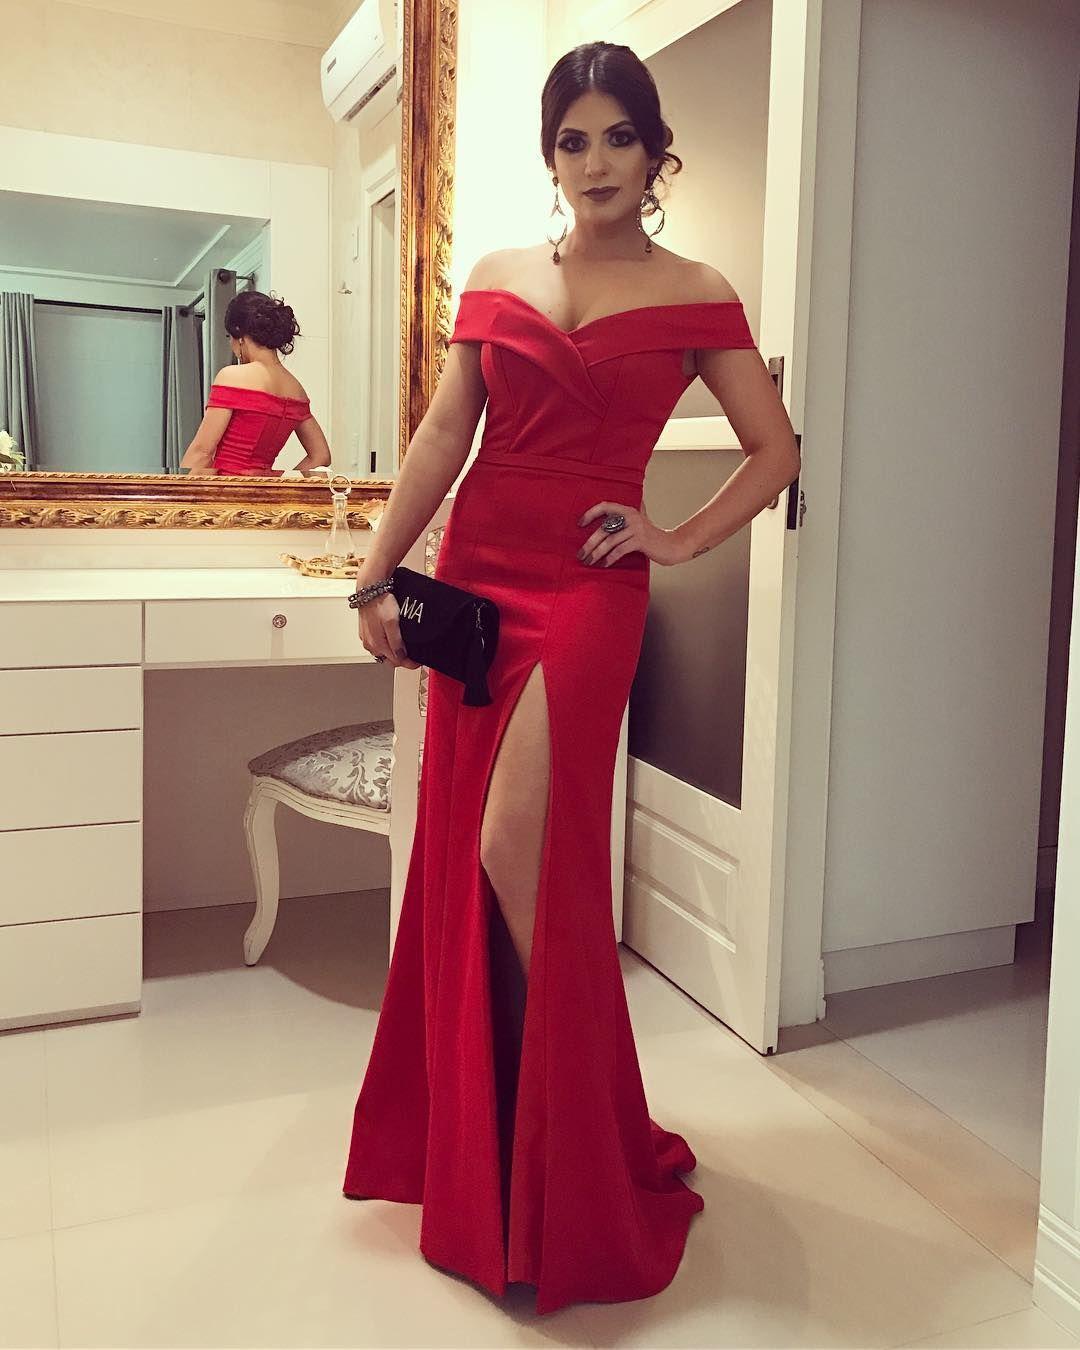 Dress look red longdress vestidolongo fenda vermelho